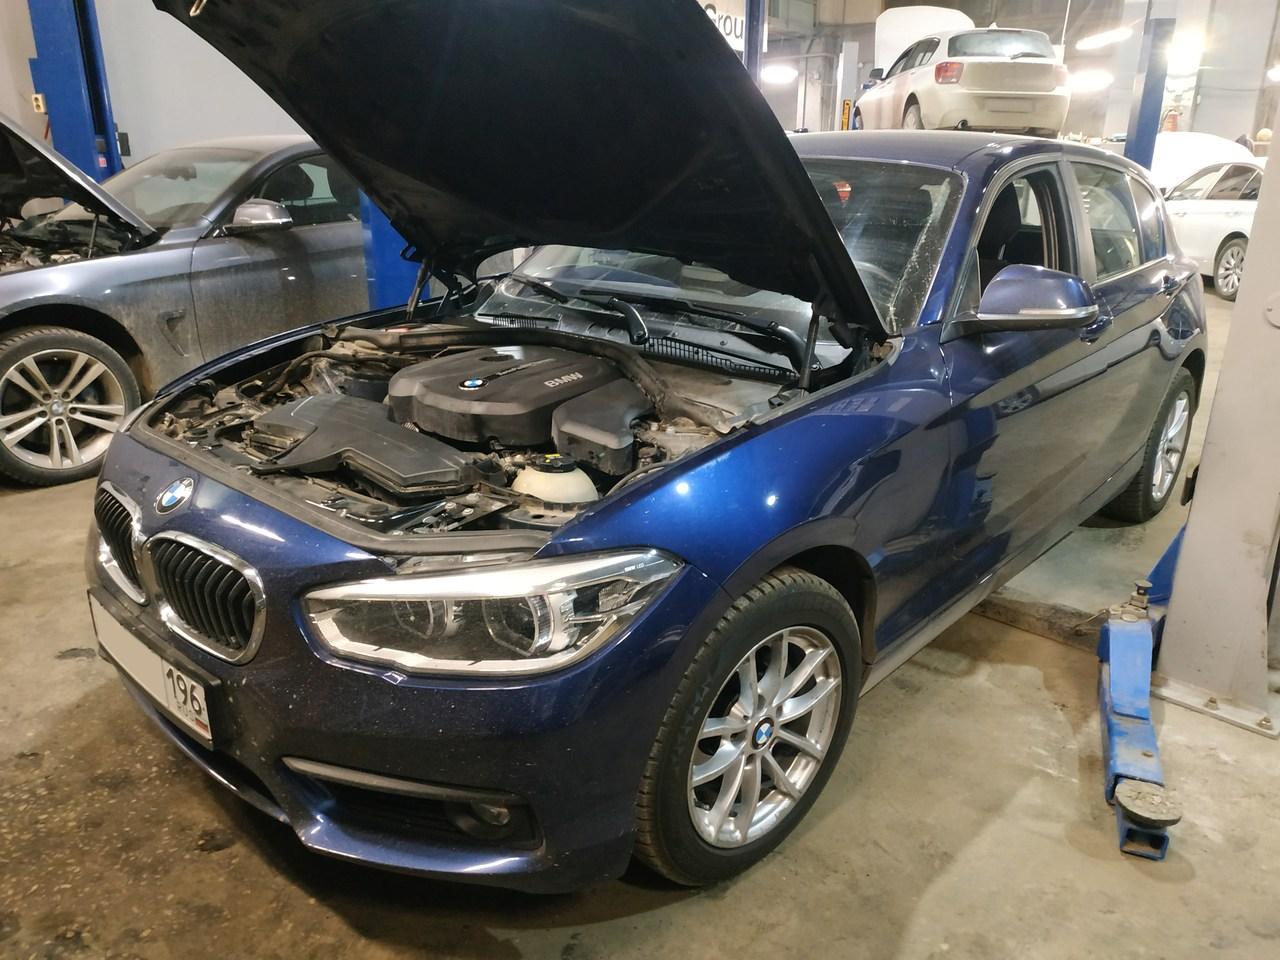 BMW F20 118i, 2017 год выпуска